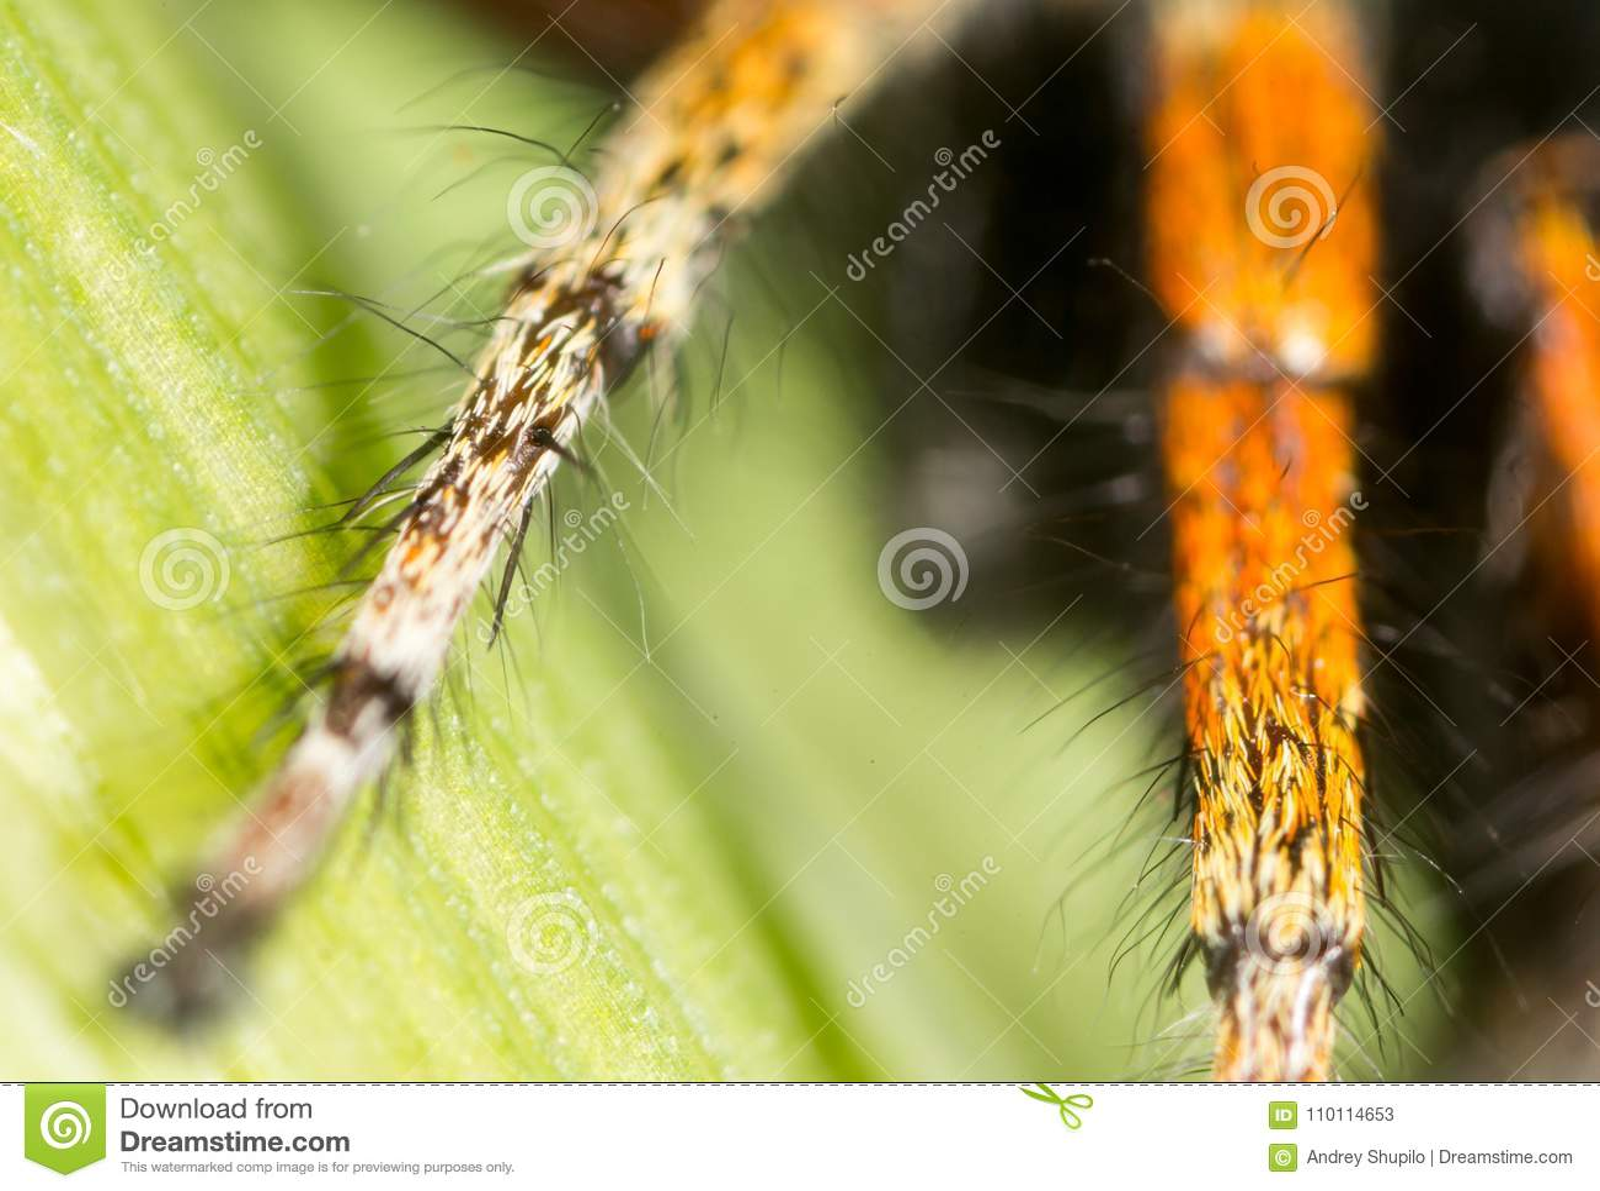 Foot spider in nature. super macro